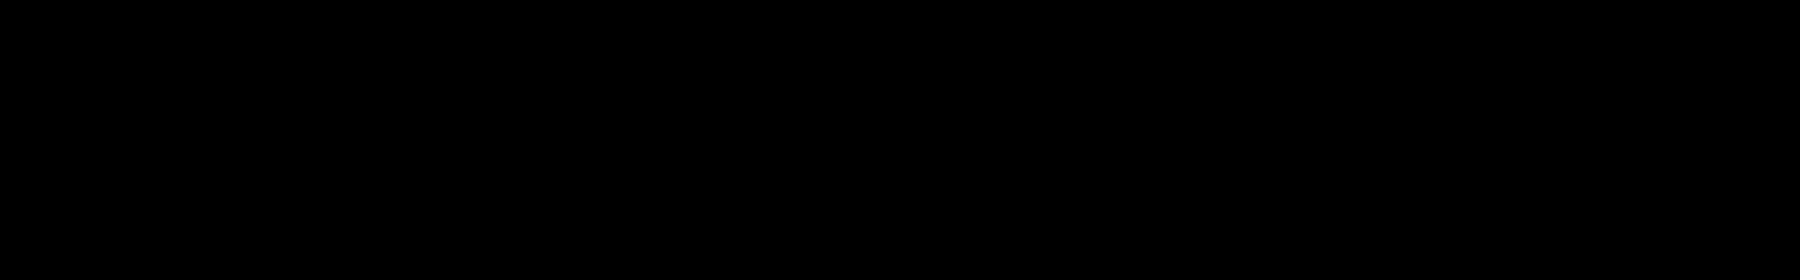 padsheaven audio waveform